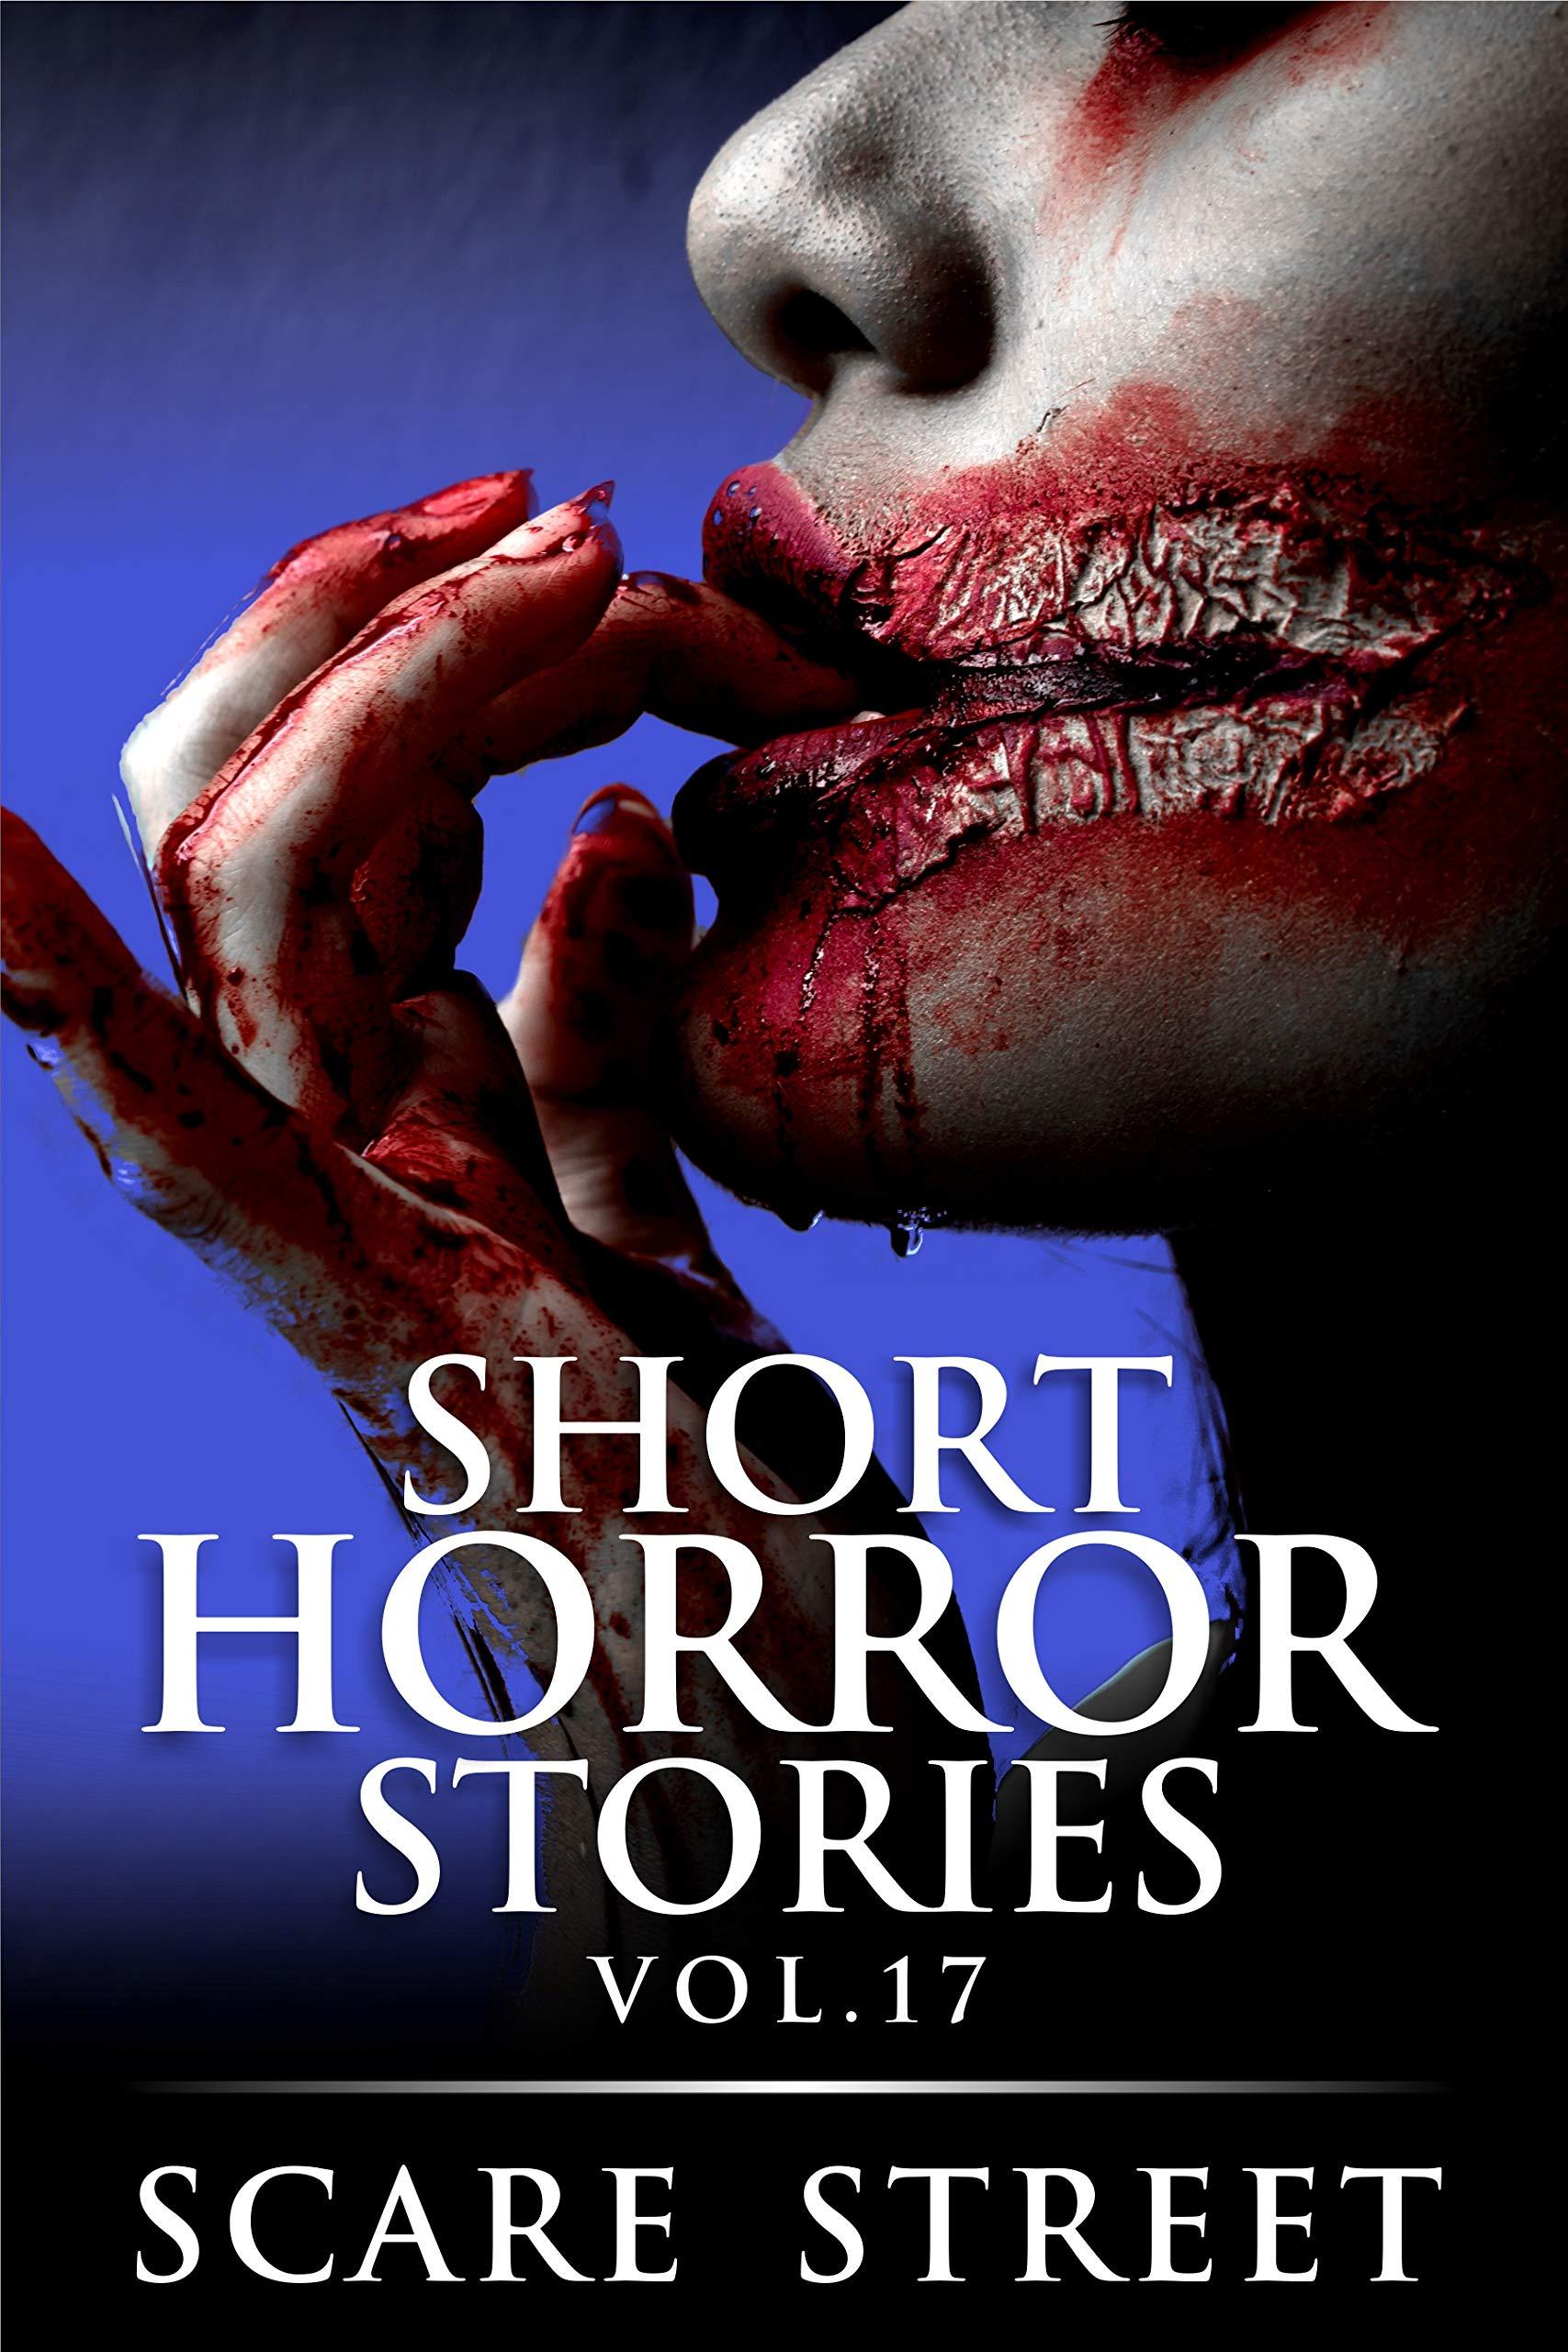 Short Horror Stories Vol. 17